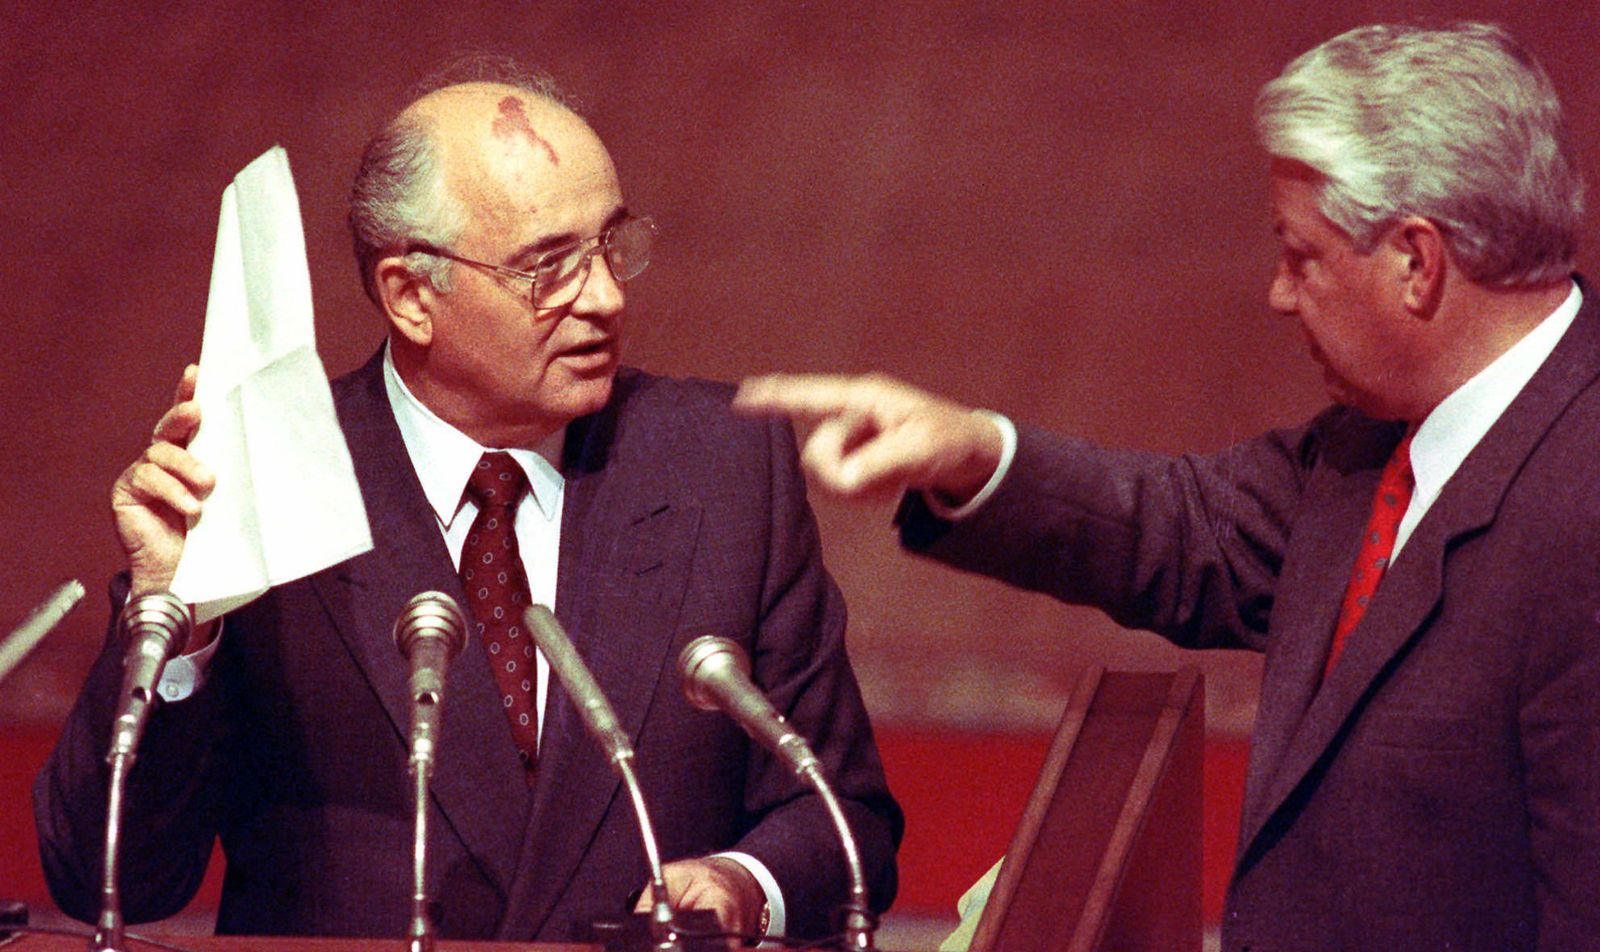 Michail Gorbatschow/ Boris Jelzin